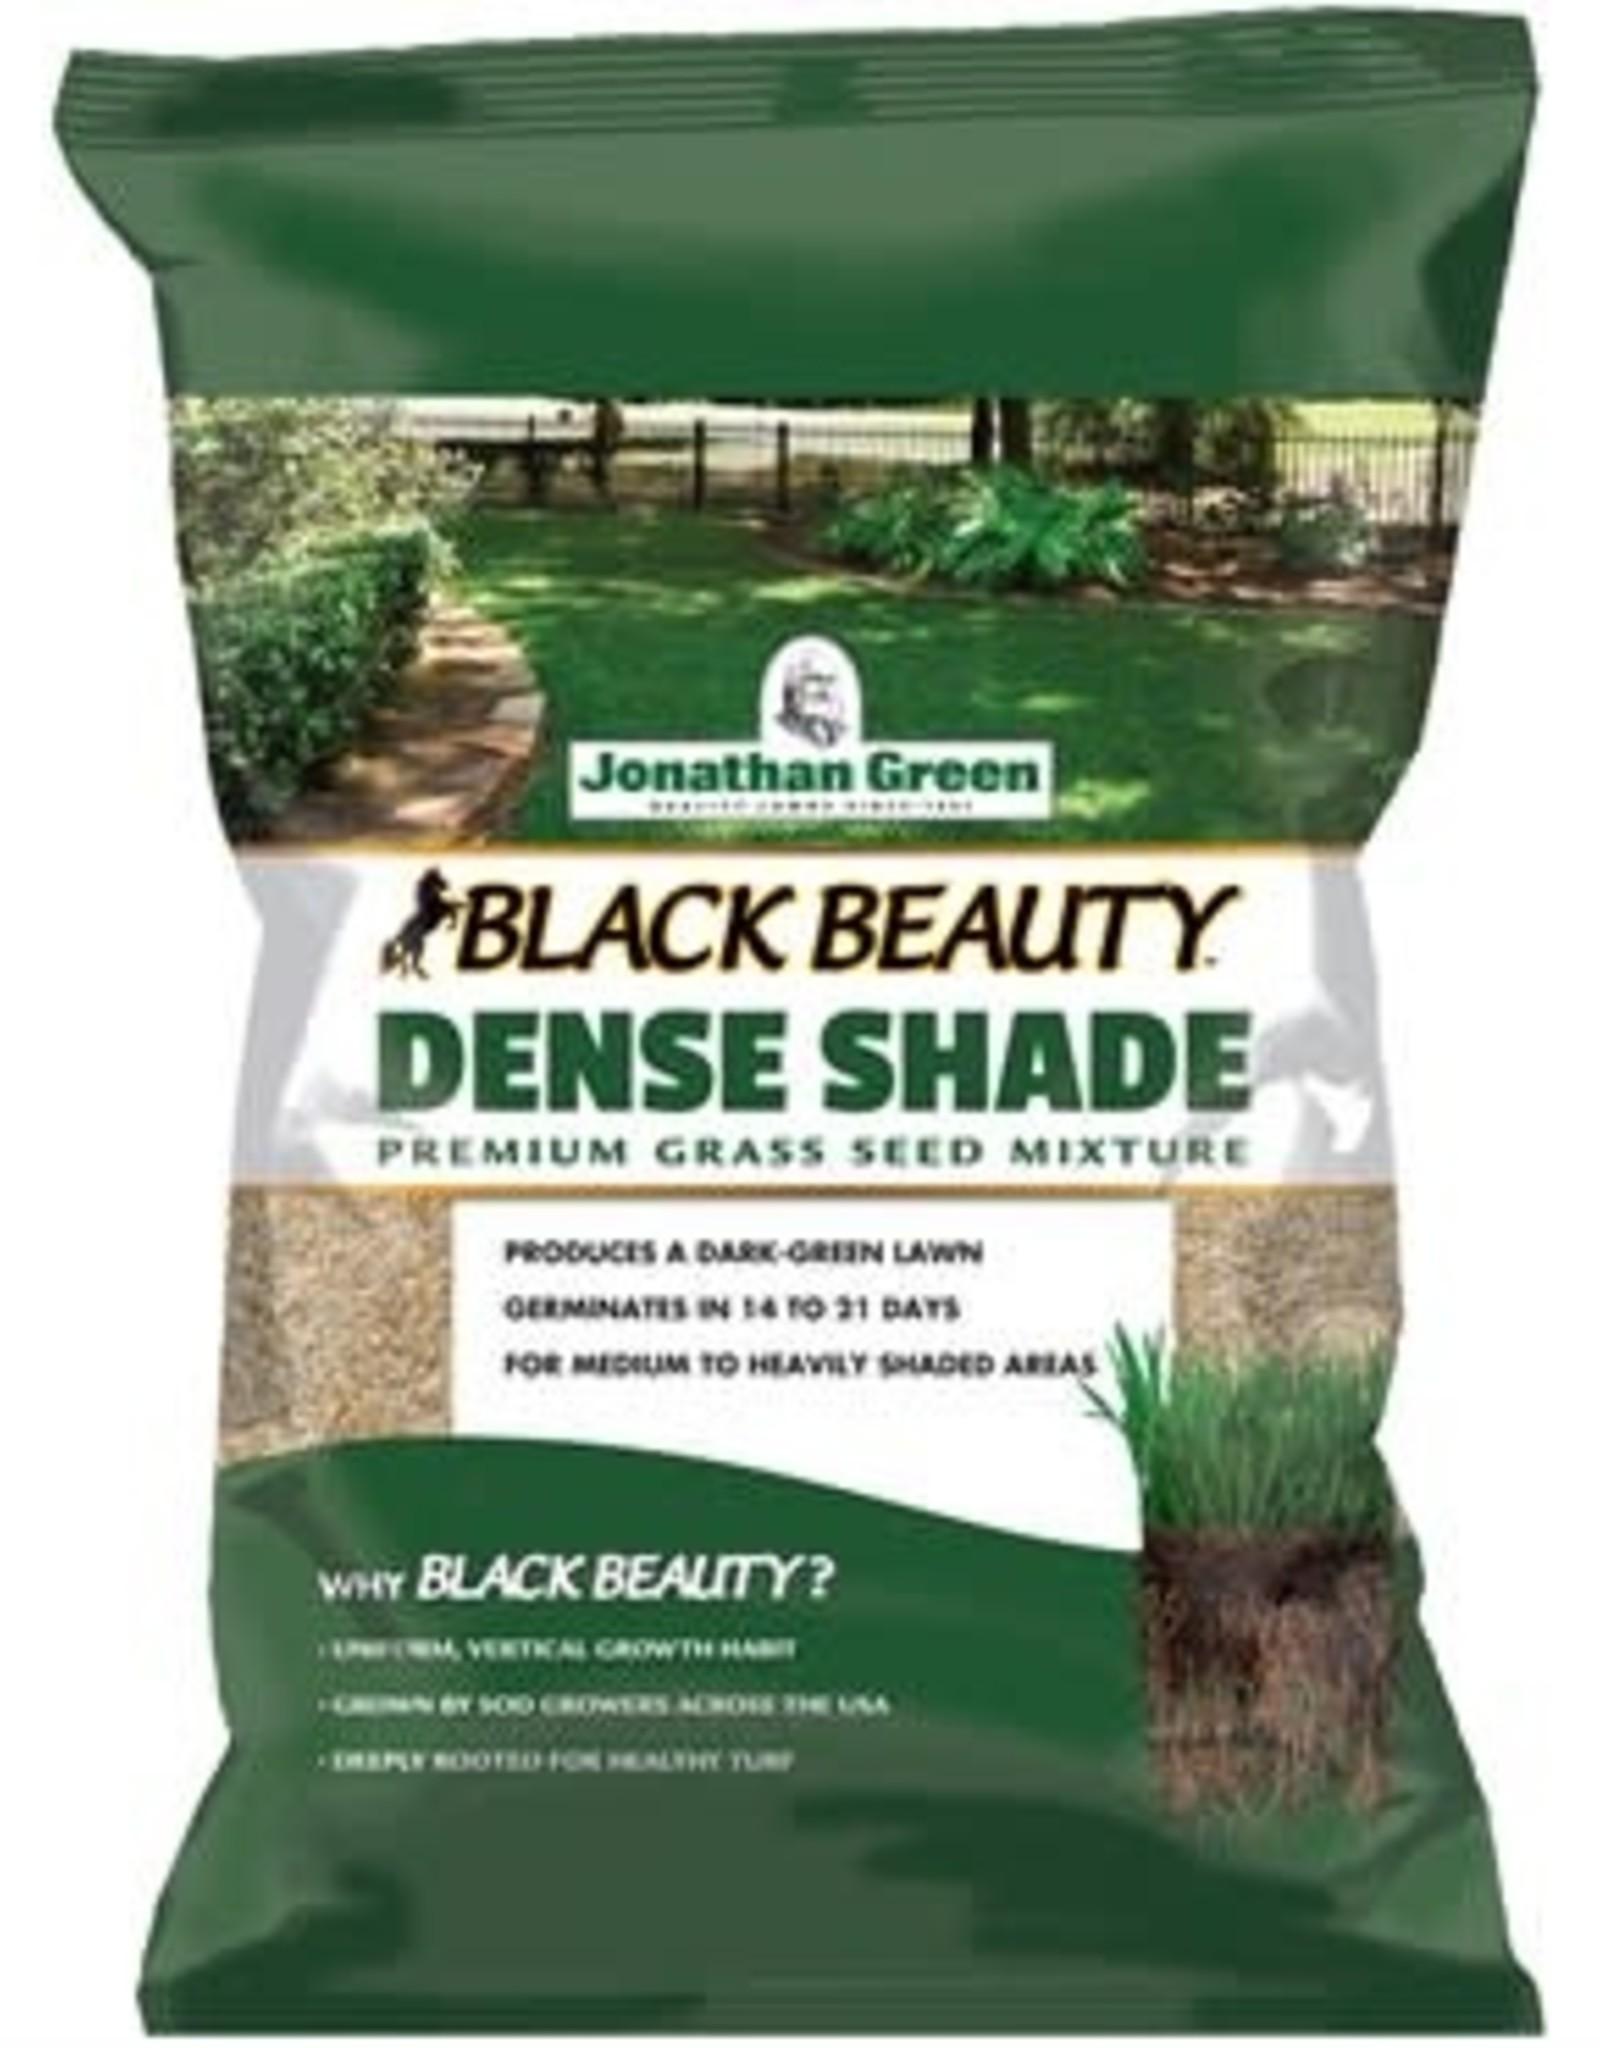 Jonathan Green Black Beauty Dense Shade